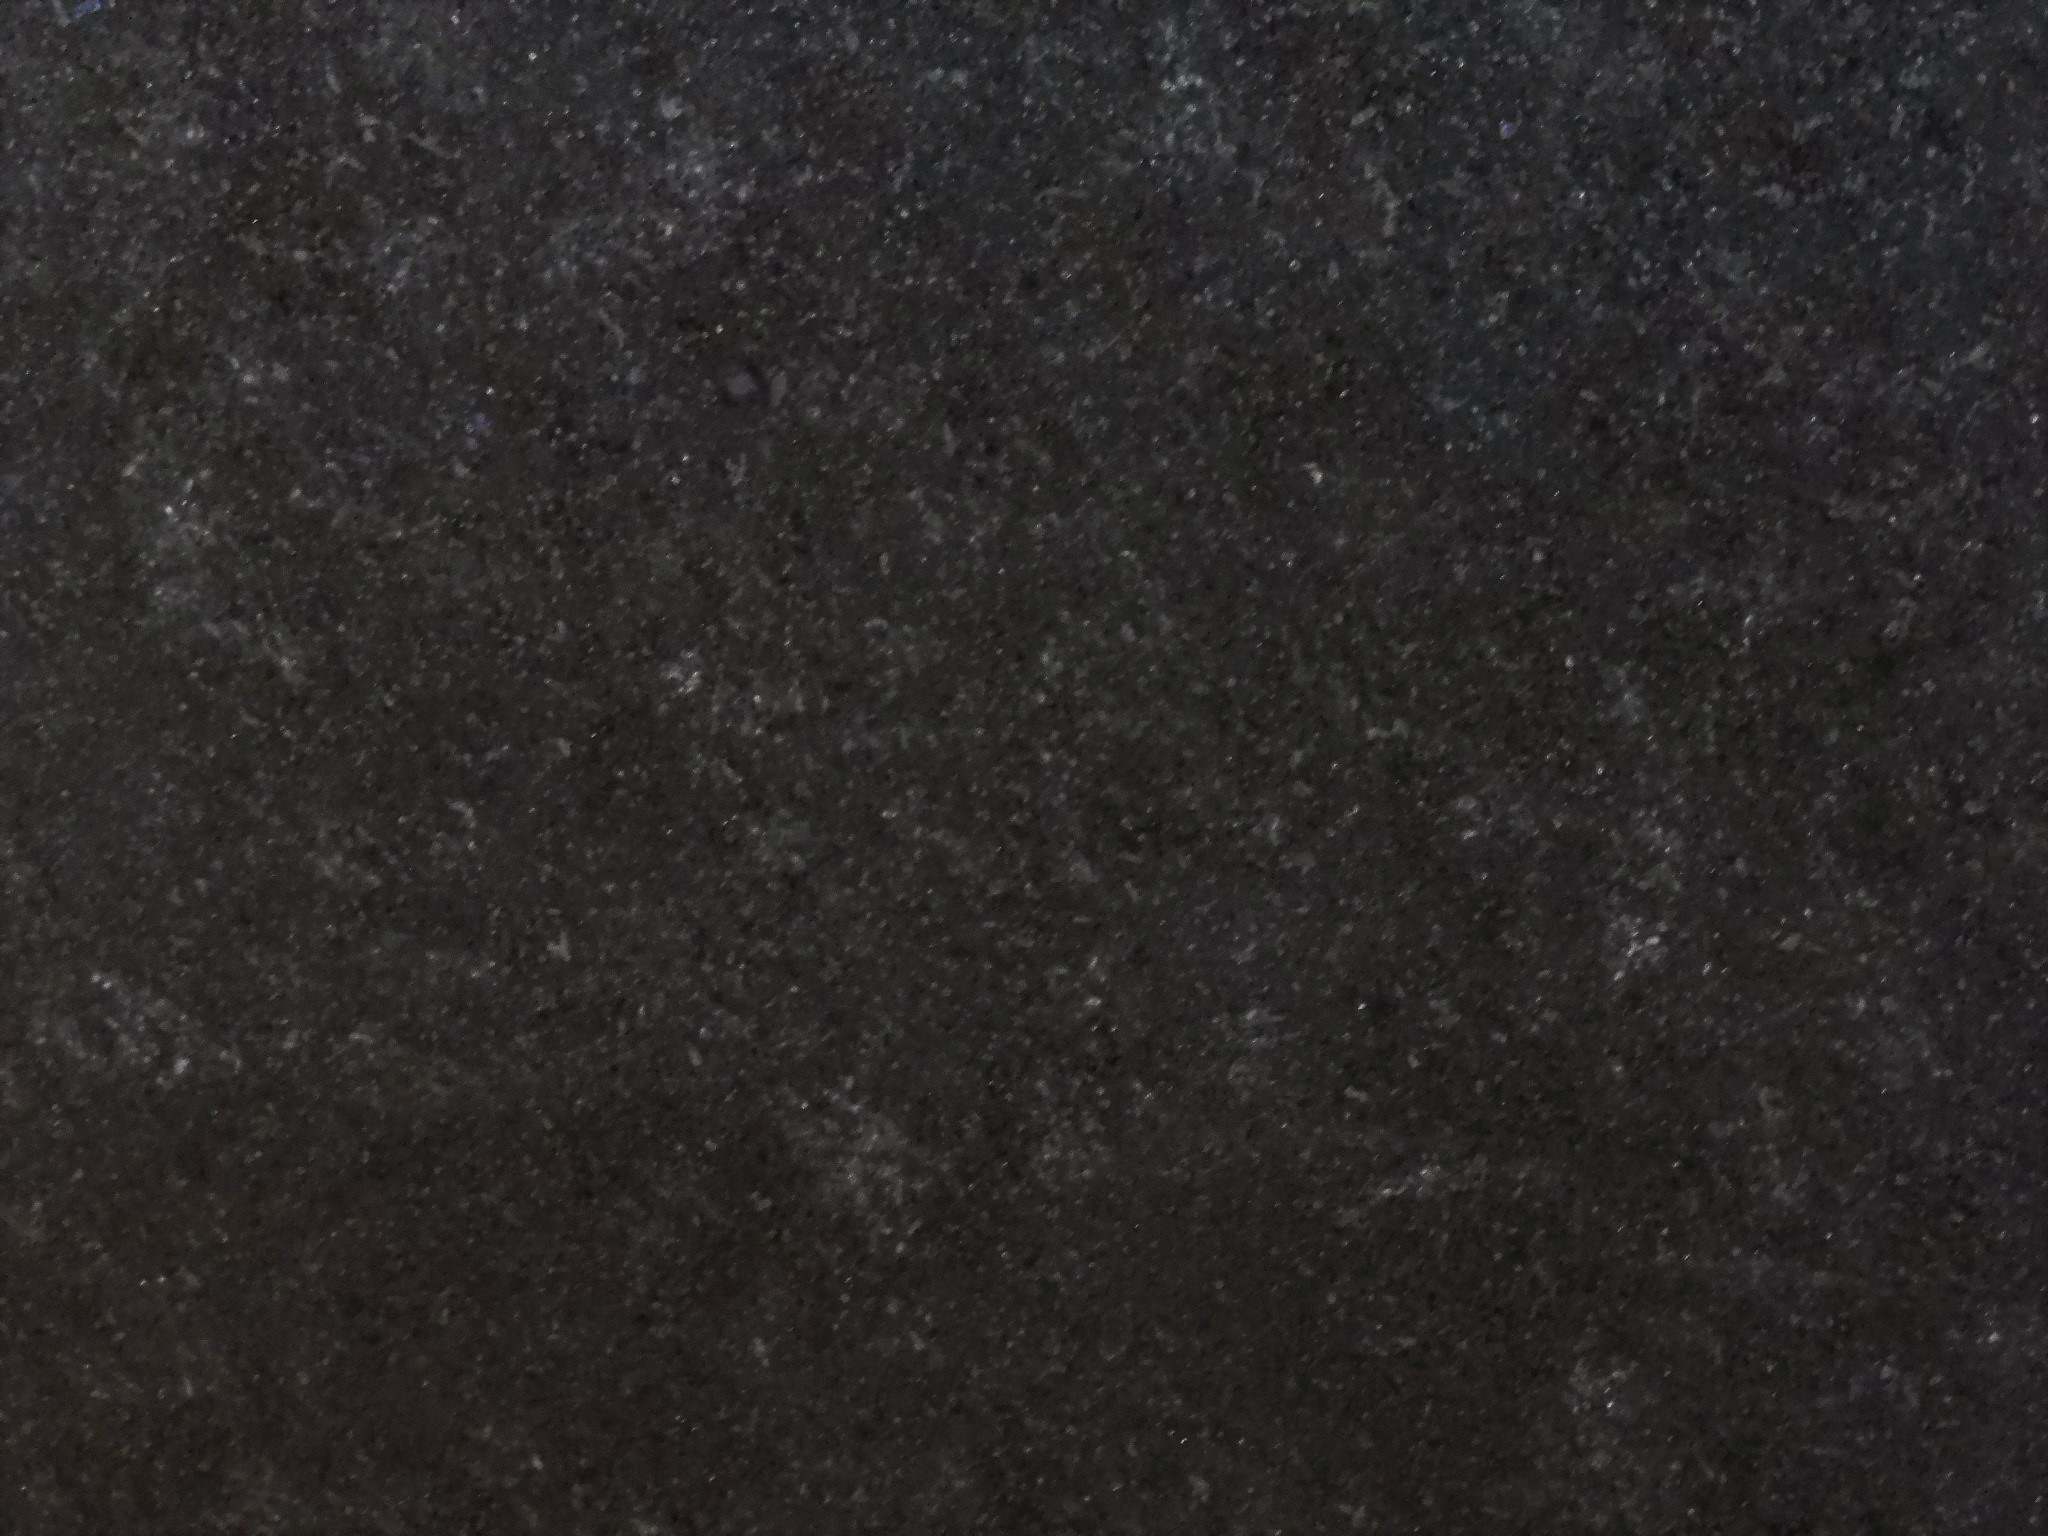 Nero Assoluto Polished | Mondial Granit S.P.A.